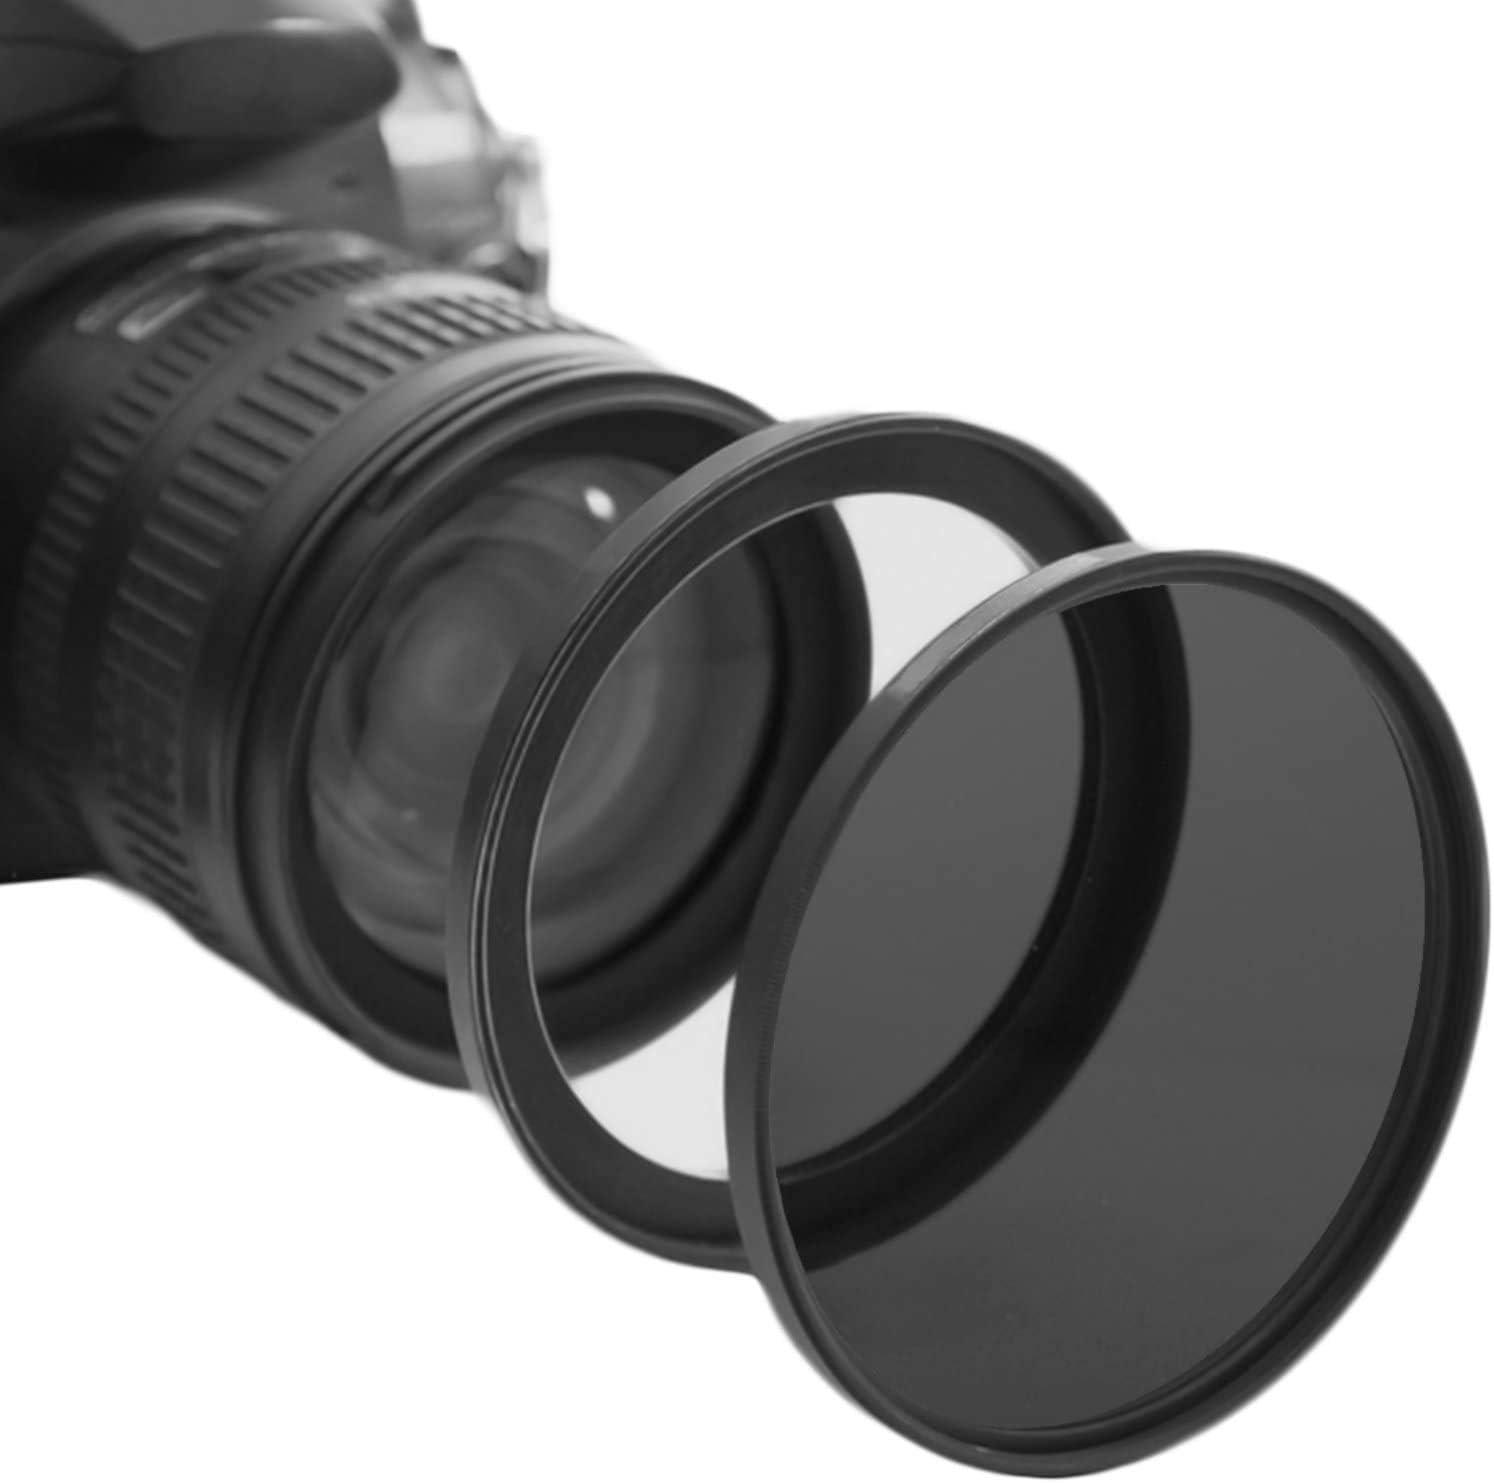 KOMET Camera Lens Filter Step-Up Ring Lens Converter Accessories 2 Pack 49mm Lens to 52mm Filter 49mm-52mm Step Up Ring